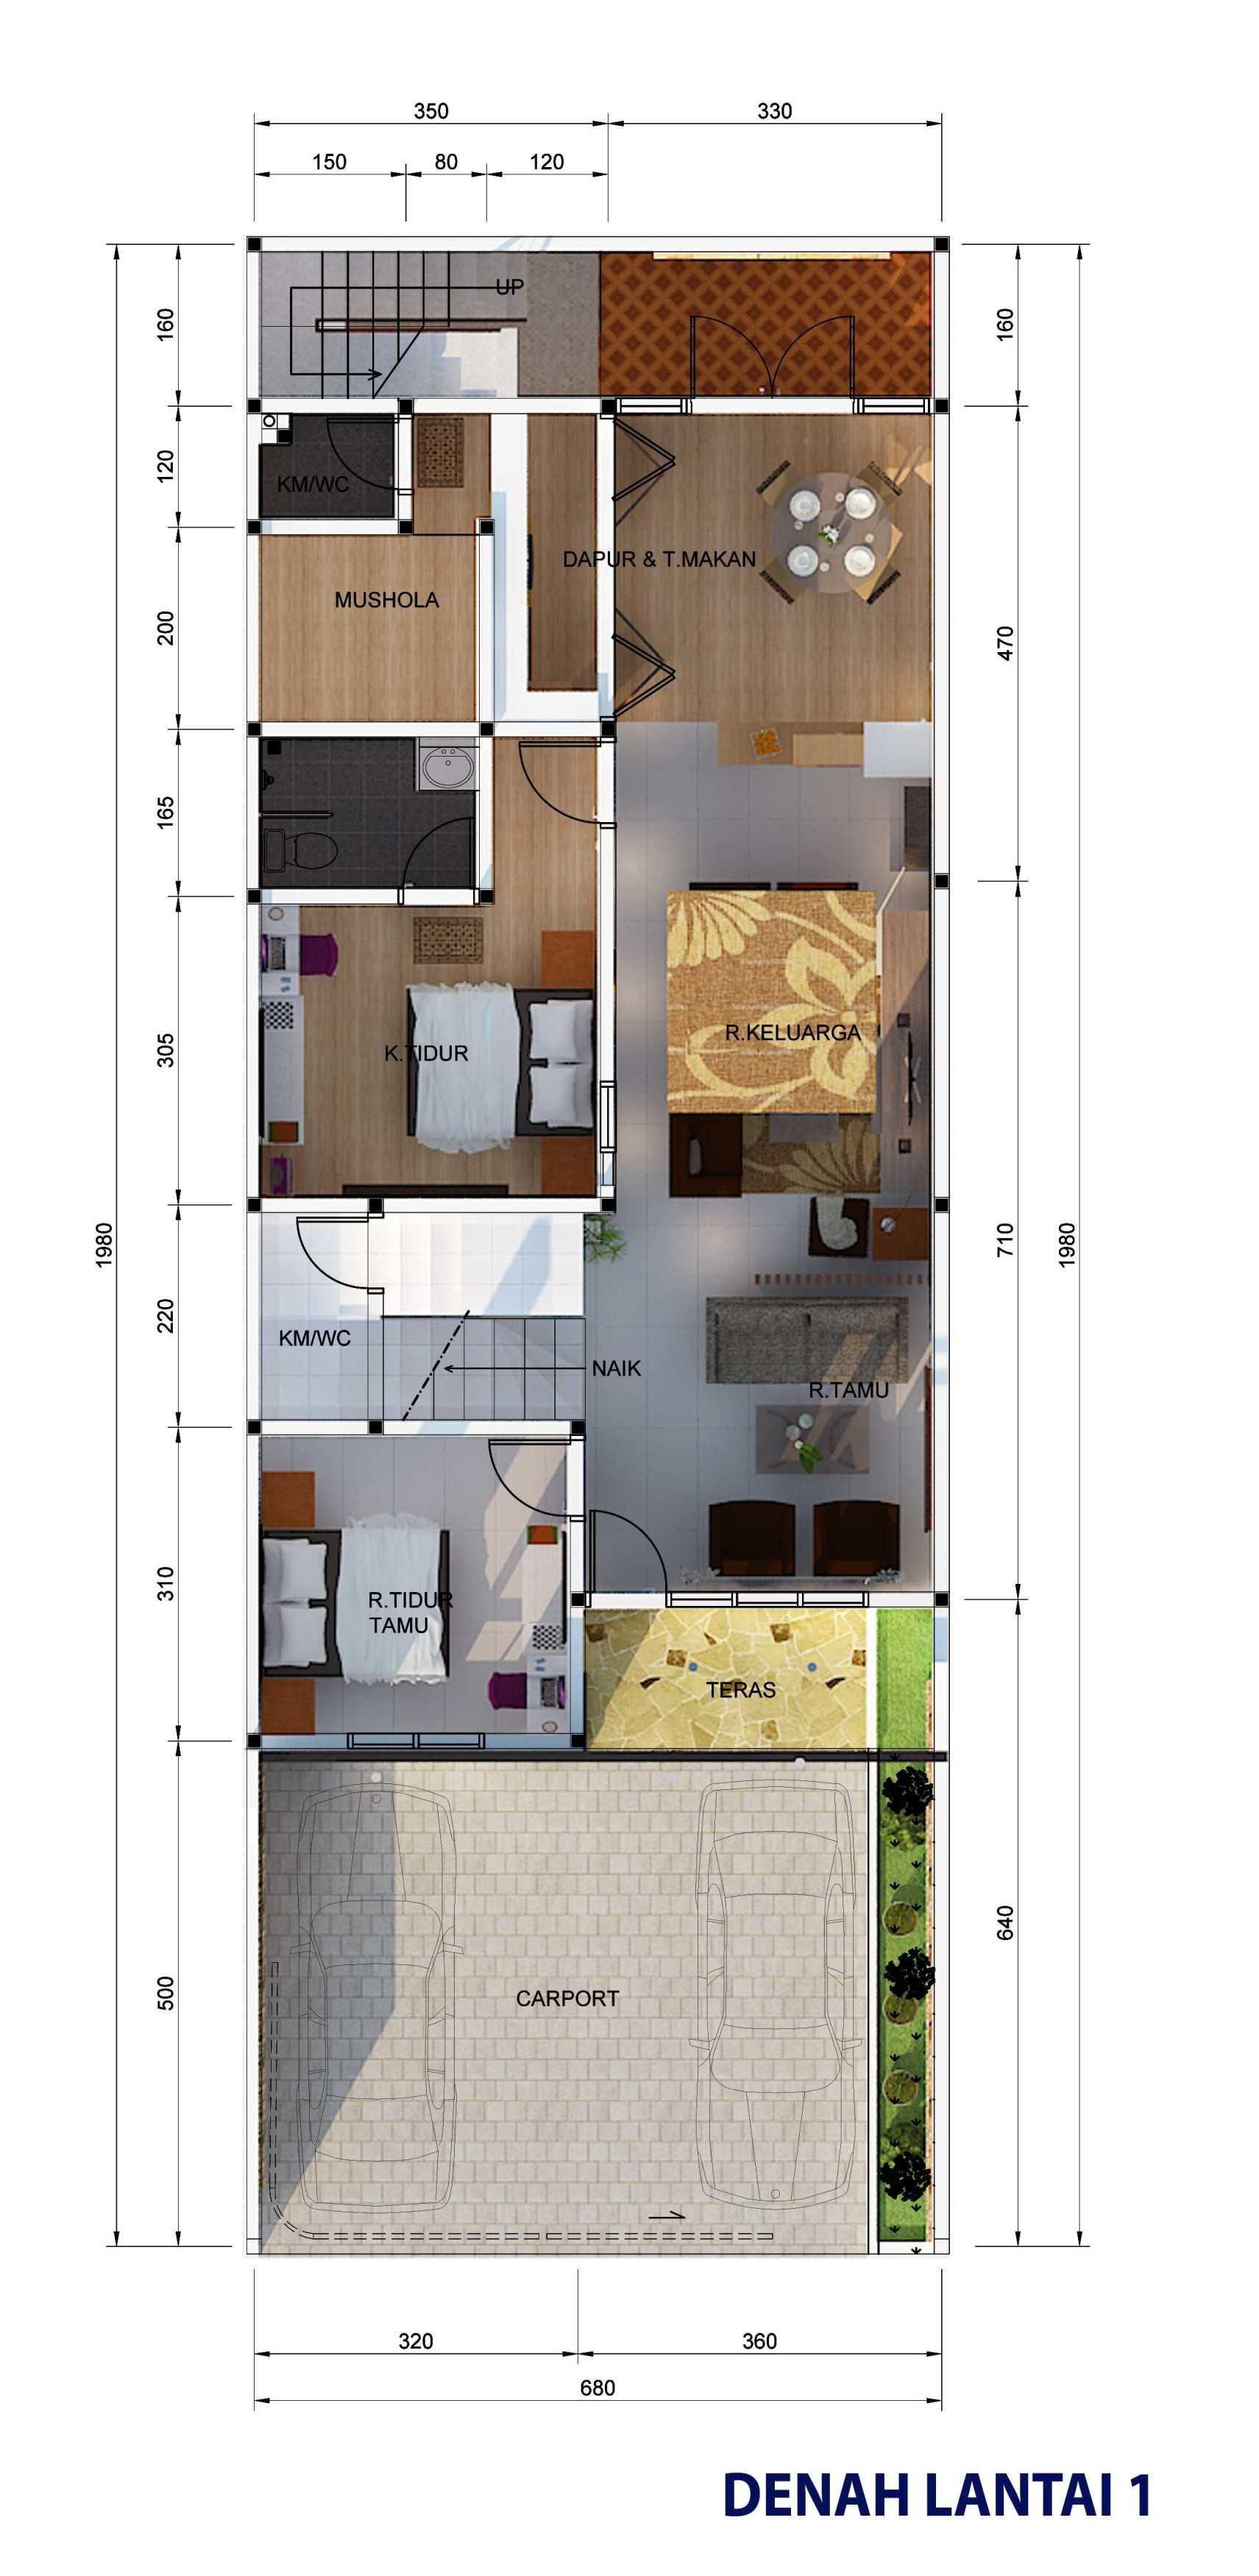 Archdesignbuild7 Project Rumah Tinggal 3 Lt Antapani , Bandung Antapani , Bandung Denah   13424